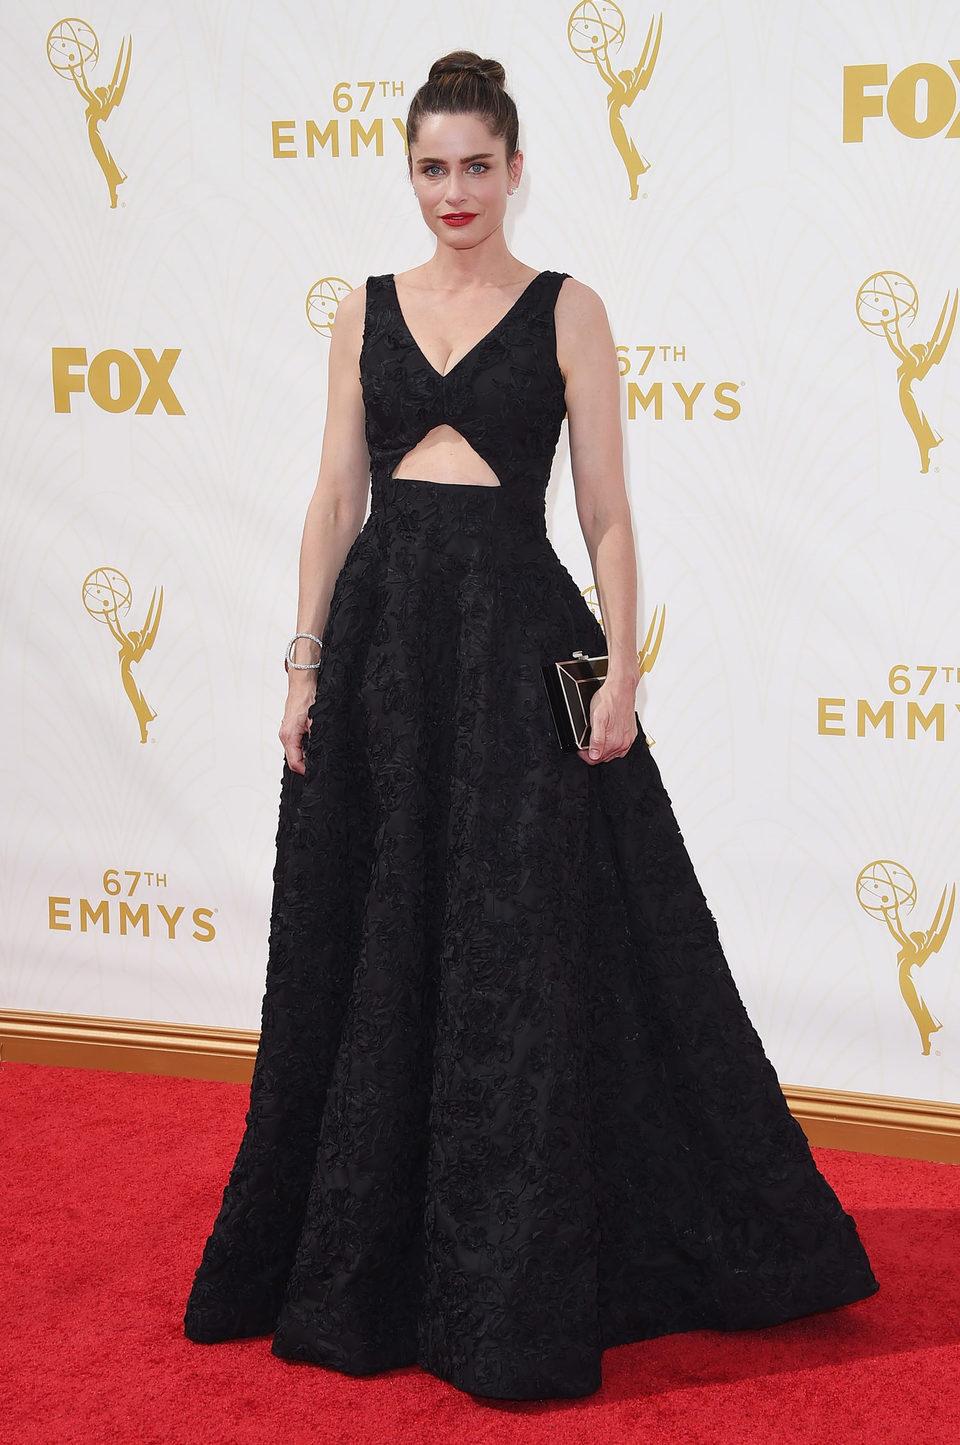 Amanda Peet at the red carpet at the 2015 Emmy Awards